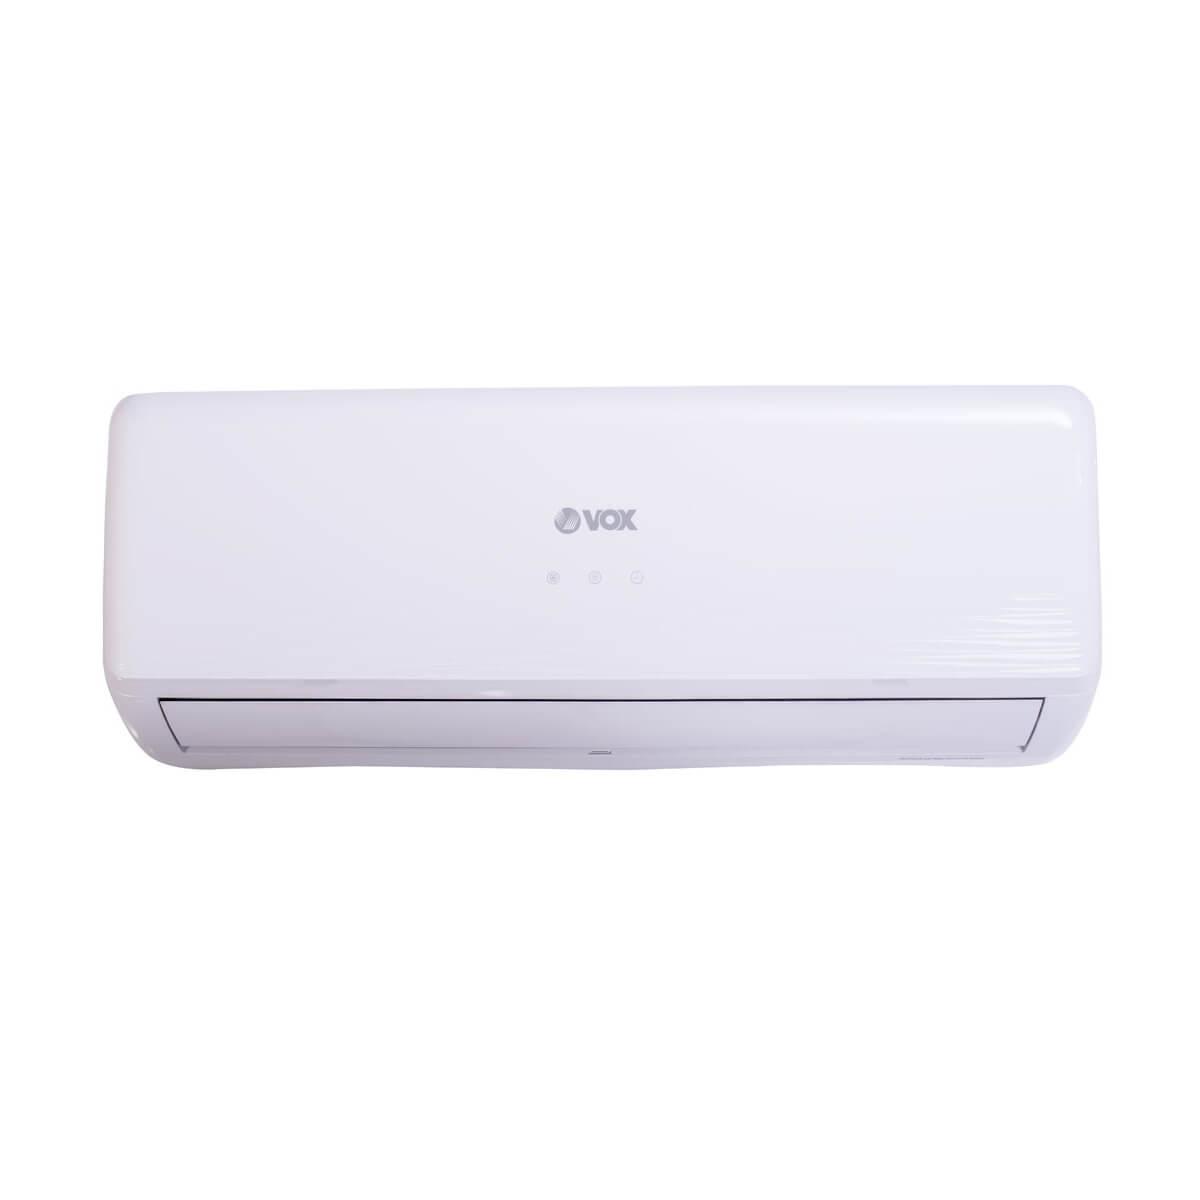 Vox klima uređaj VSA9 - 12BE - Inelektronik